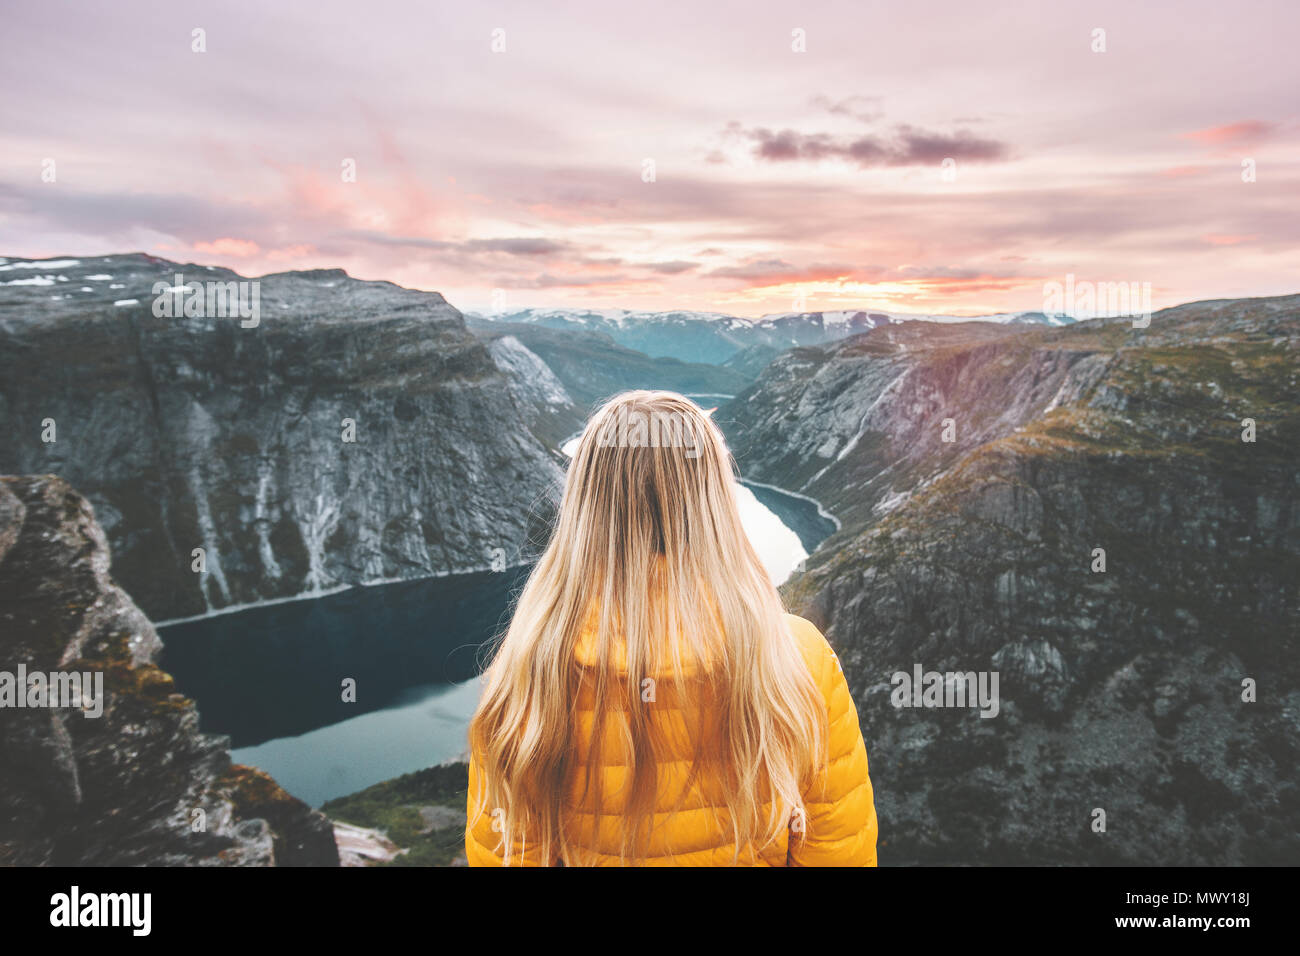 Woman traveling alone enjoying sunset mountains landscape adventure trip lifestyle vacations weekend getaway aerial Norway lake landscape - Stock Image